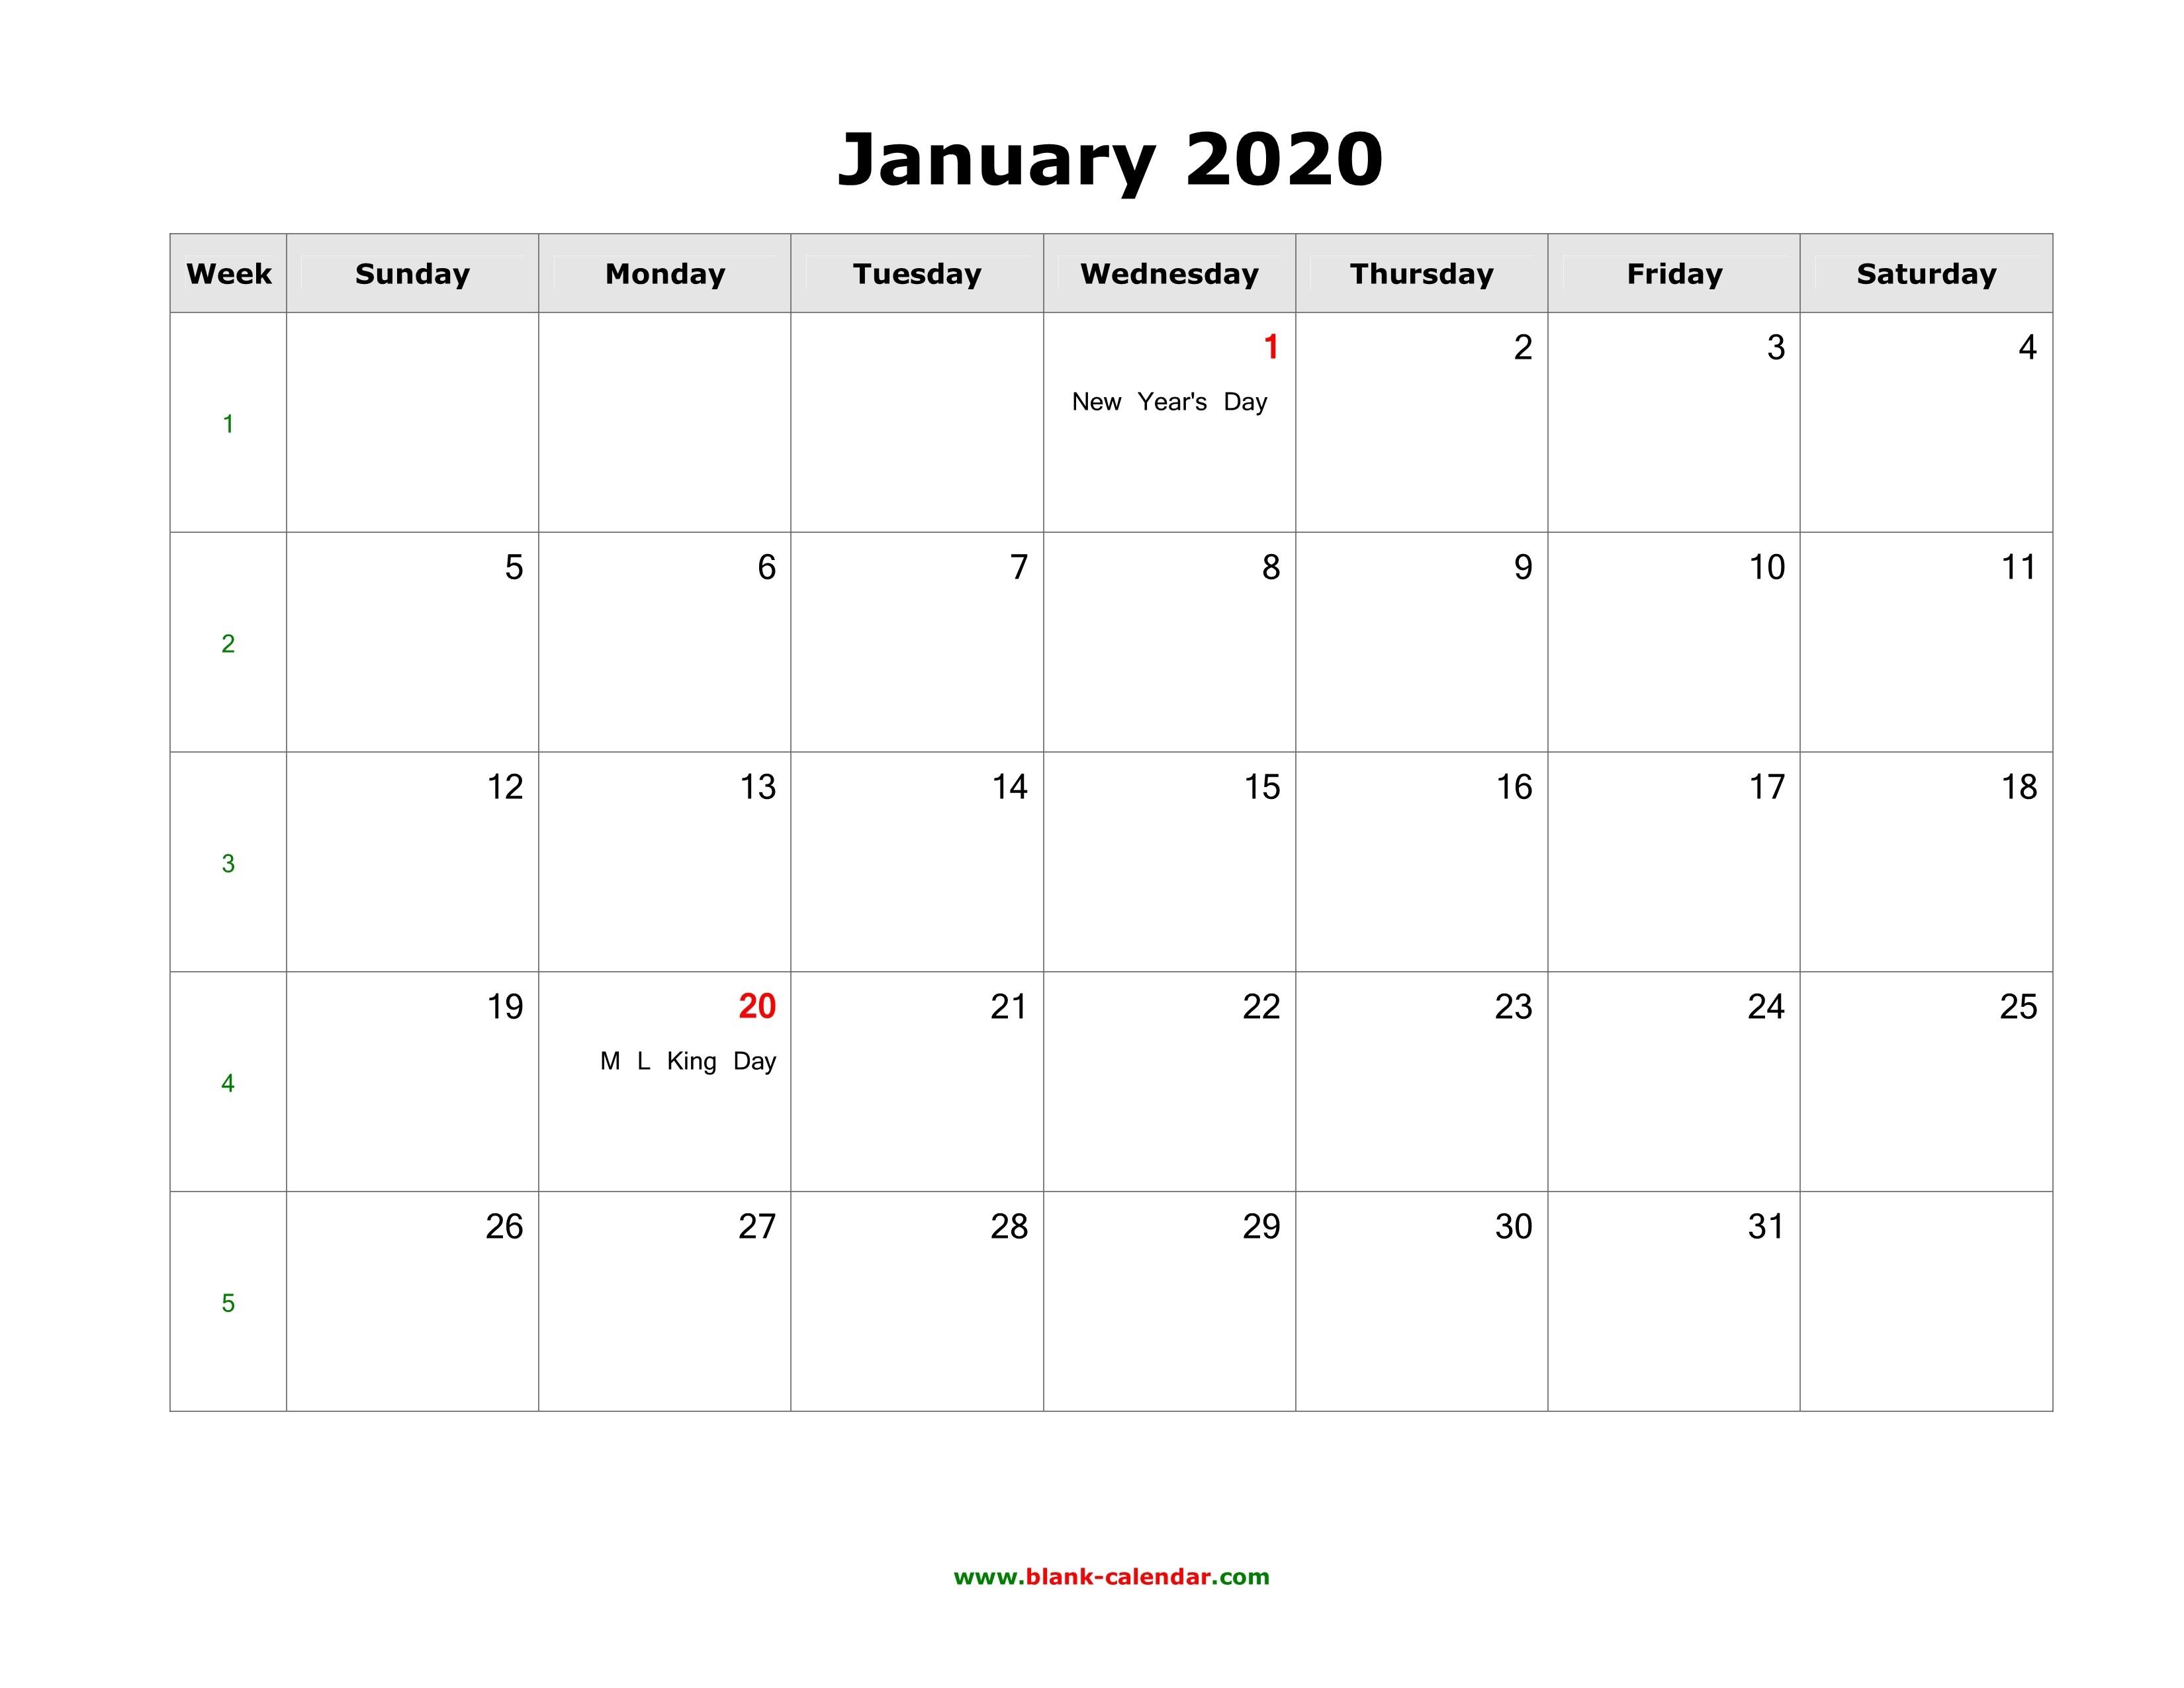 January 2020 Blank Calendar | Free Download Calendar Templates-Free Printable January 2020 Calendar With Holidays